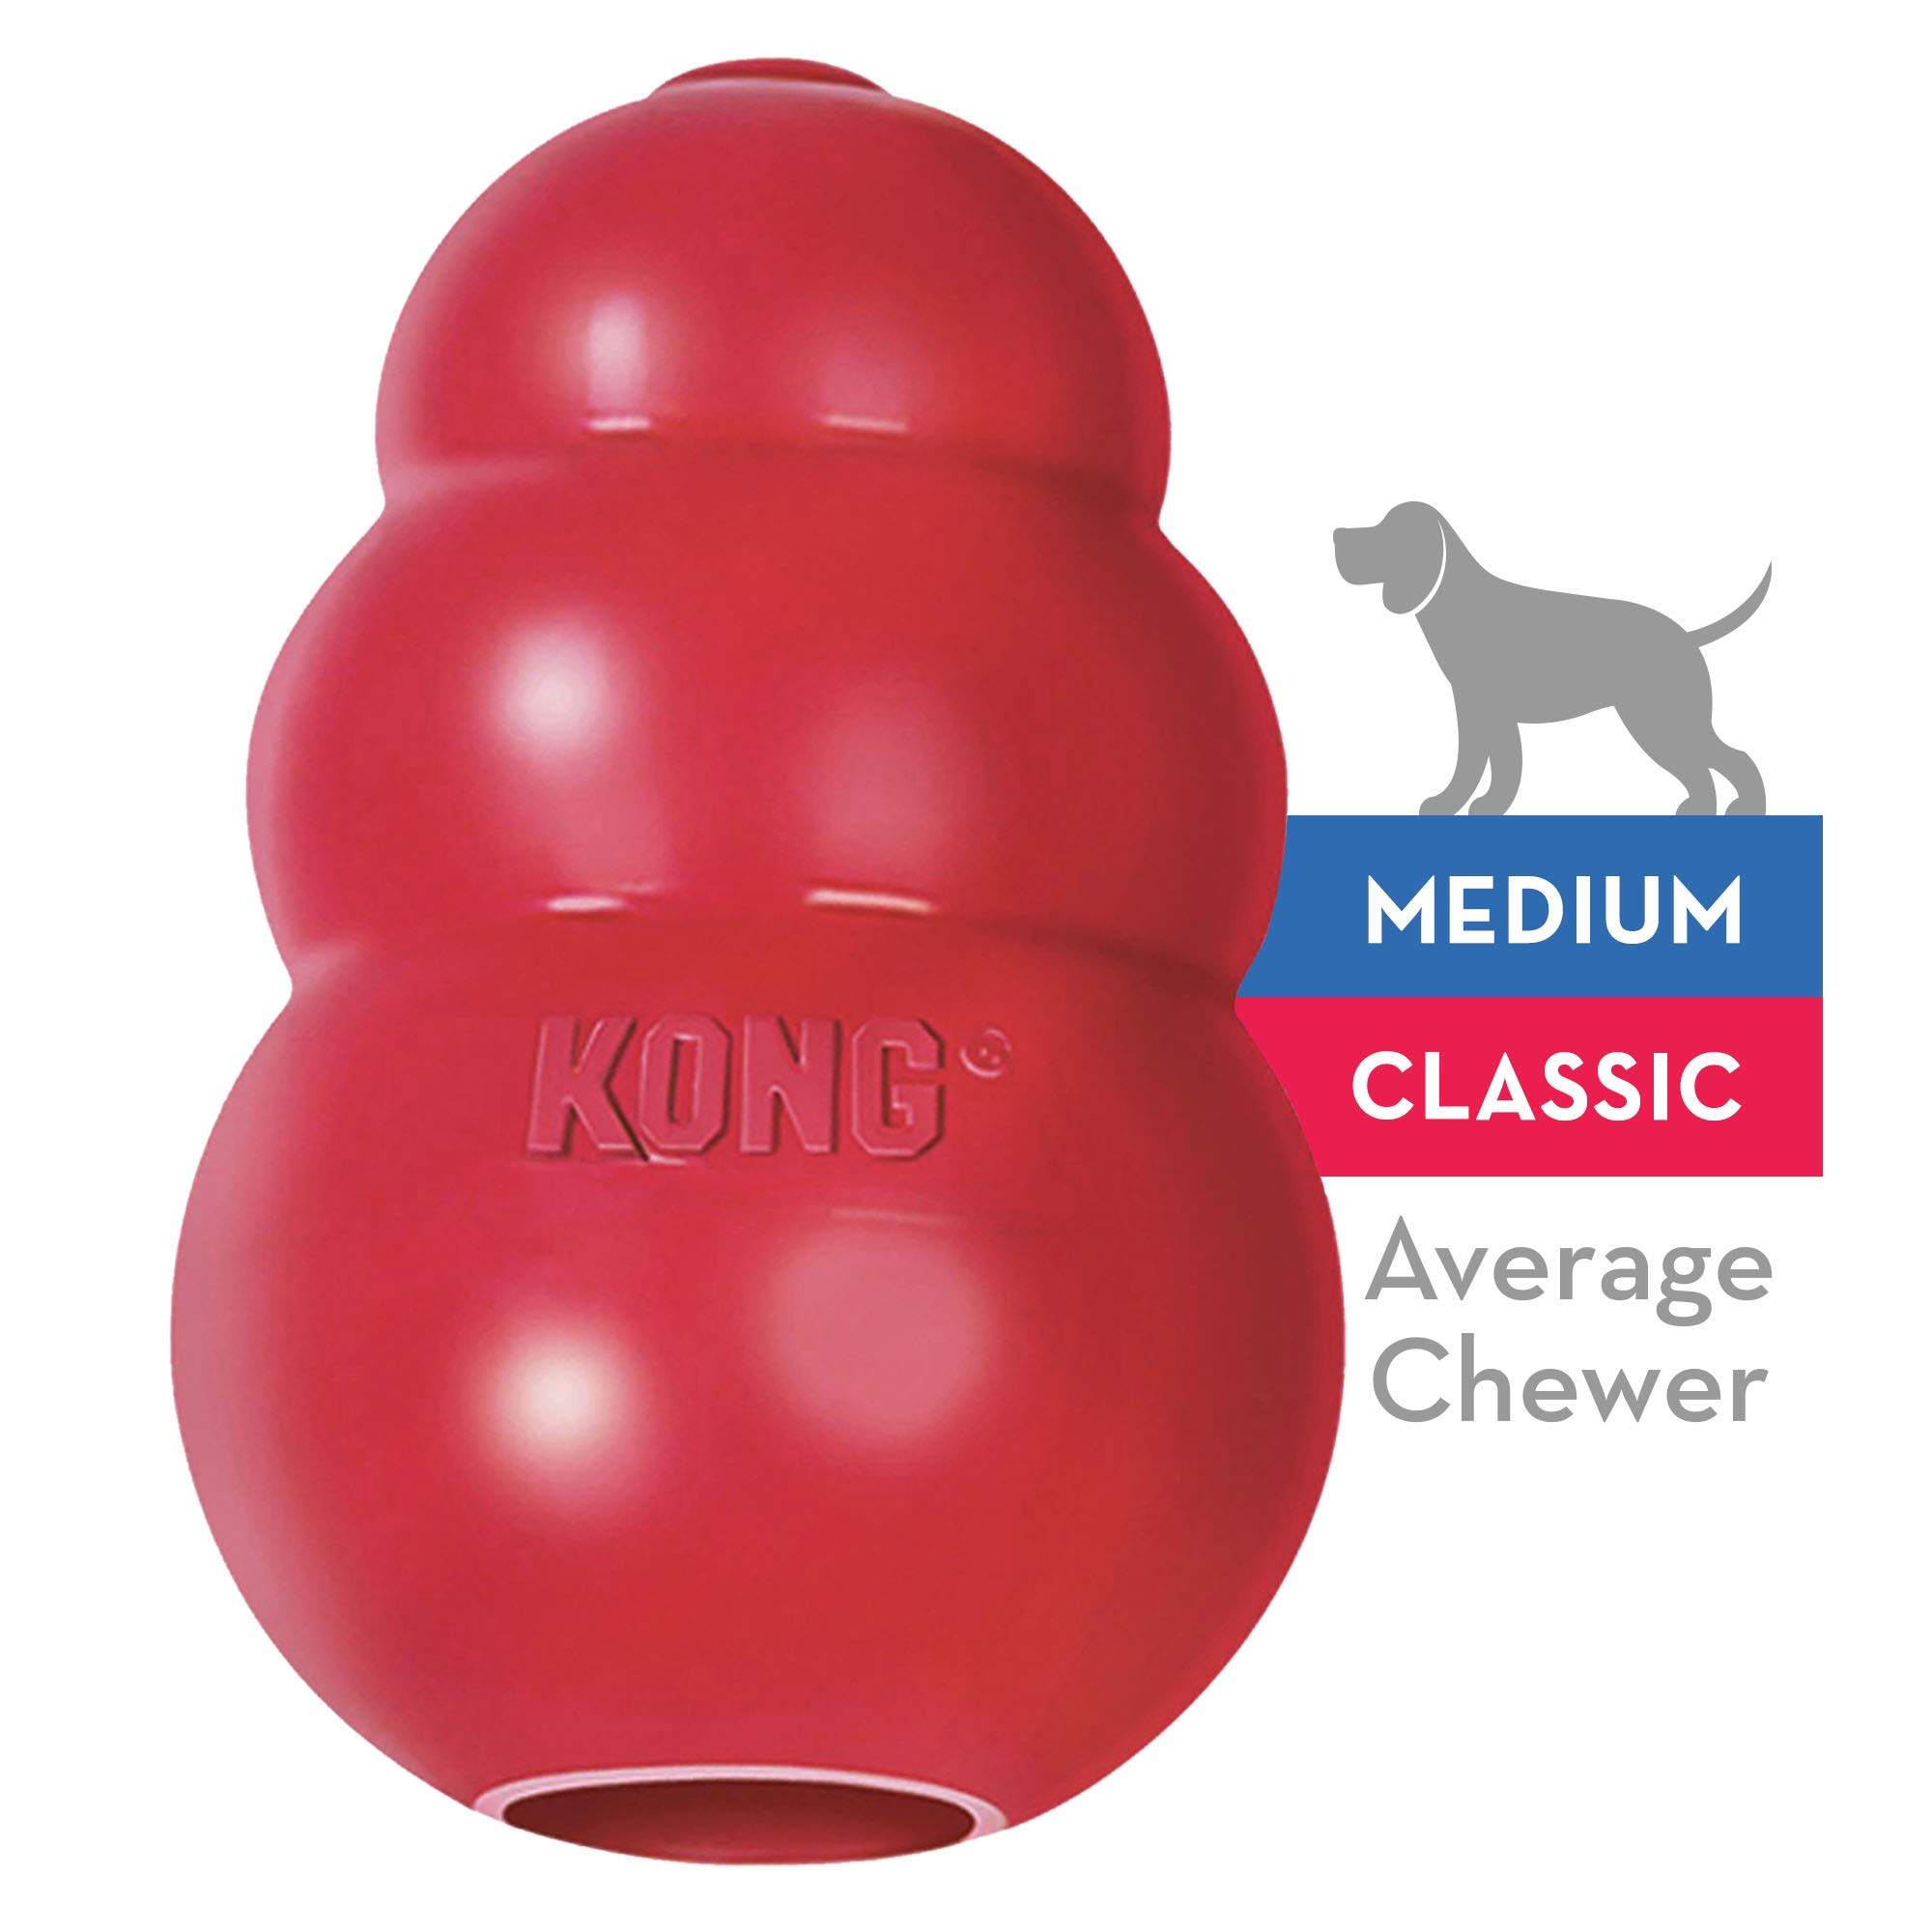 Kong JU03001 Classic M, Rojo product image